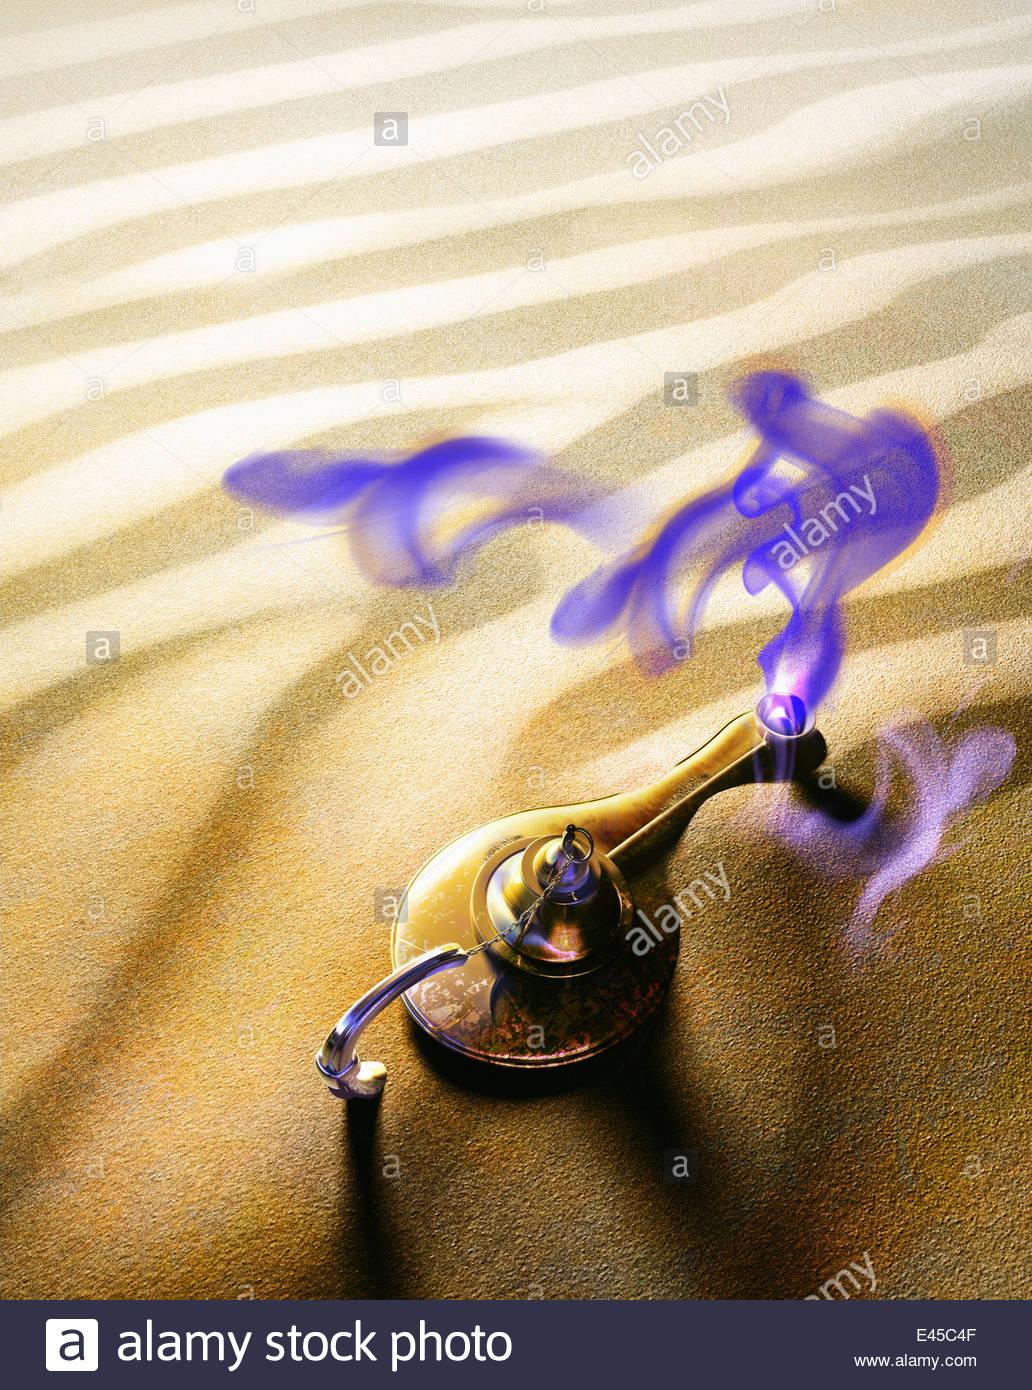 Purple smoke rising from magic lamp in desert - Stock Image